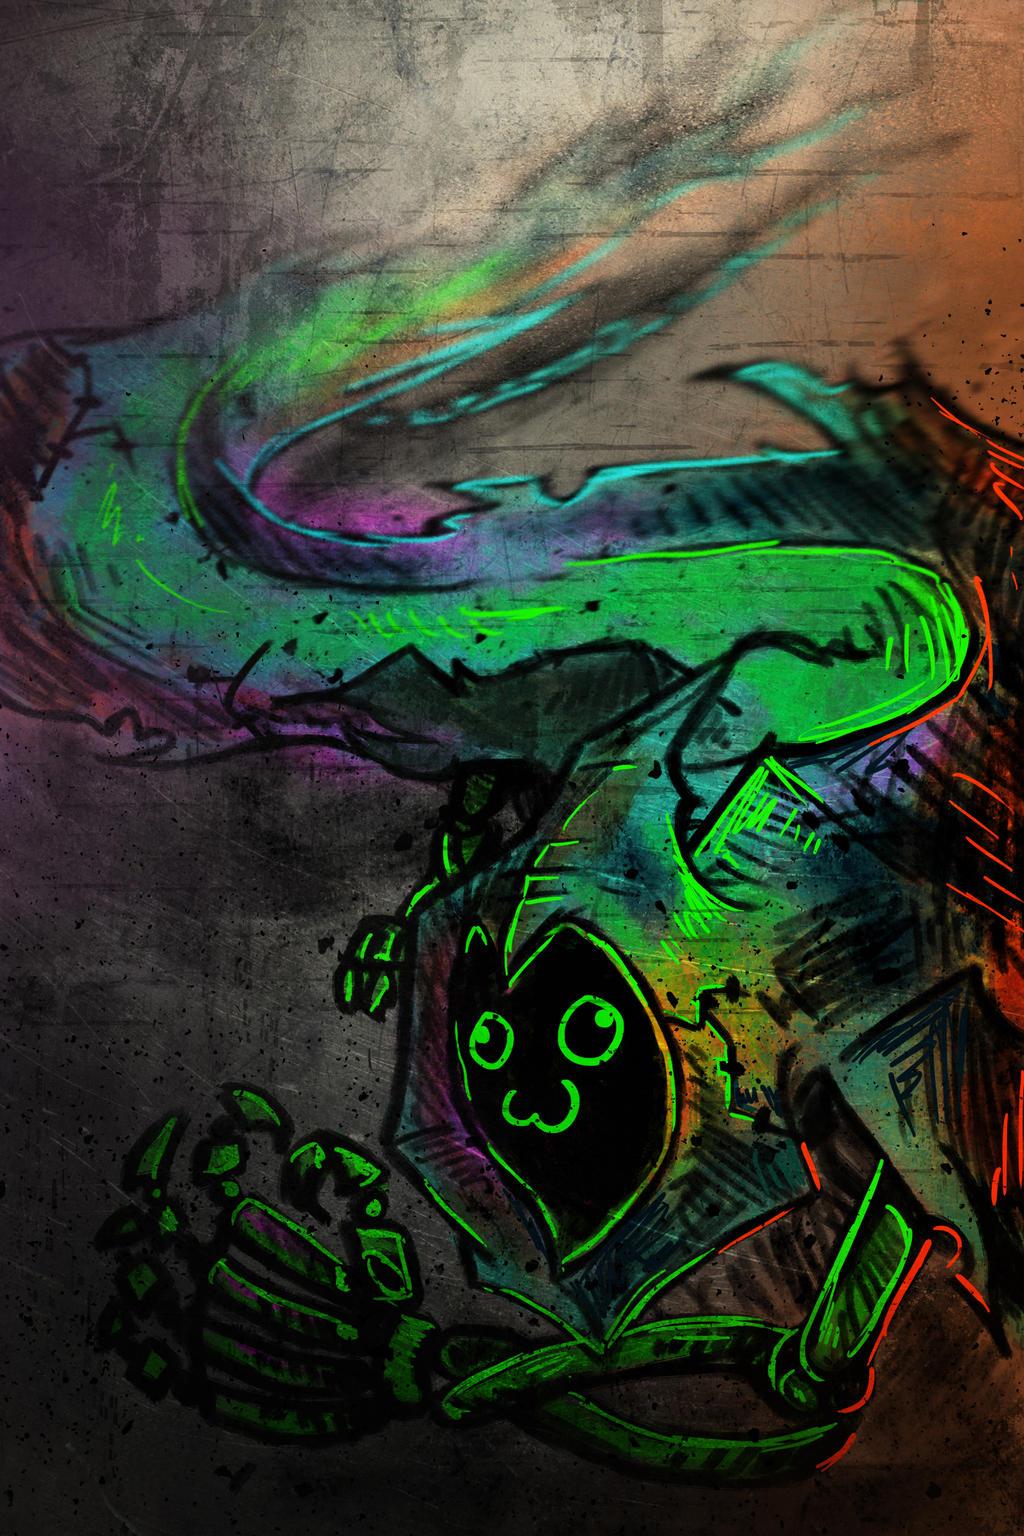 Spooky scary ghost? by FabloTheGayMoth on DeviantArt